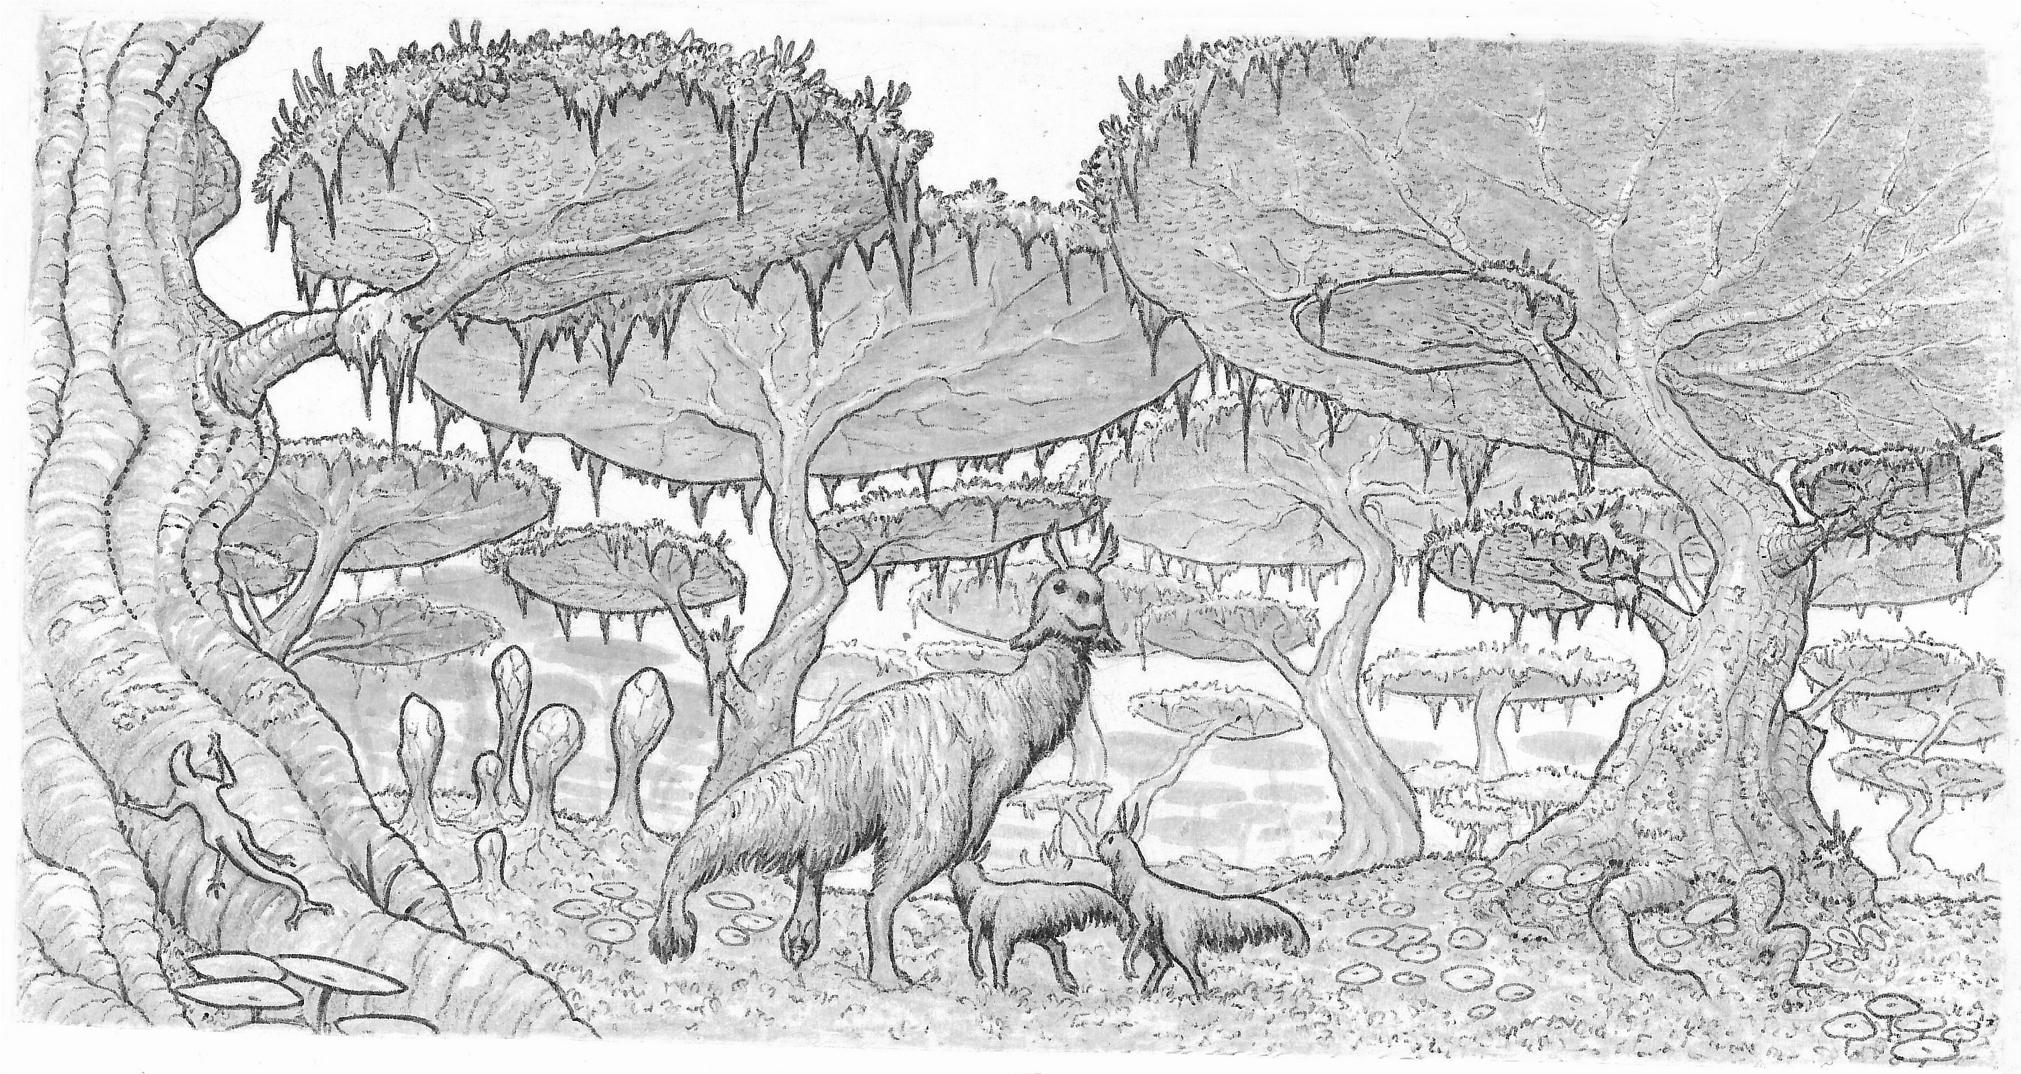 Shroom forest